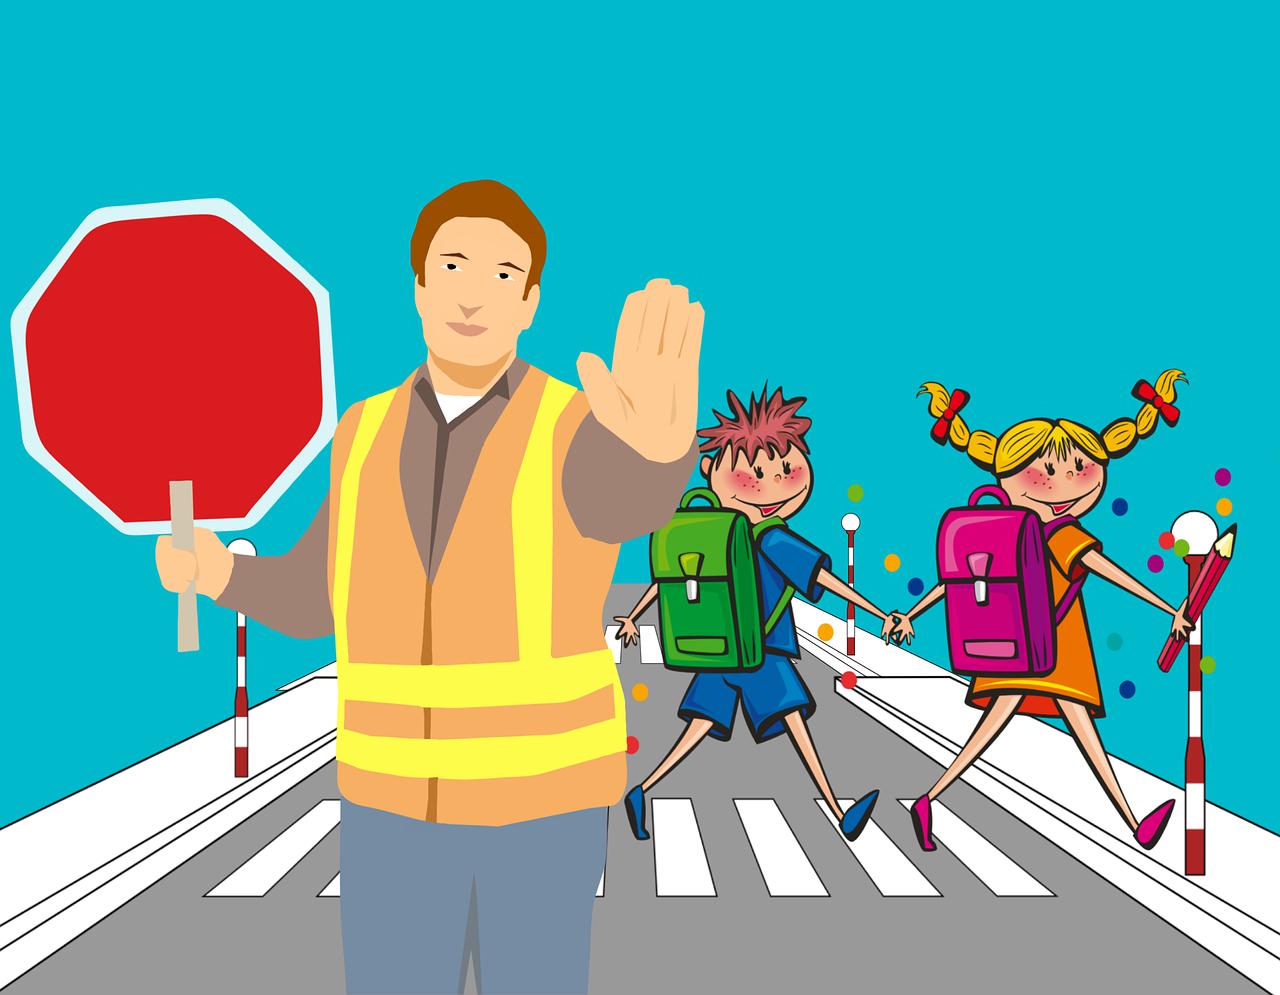 Cartoon,school,road,pedestrian crossing,traffic - free image from ...